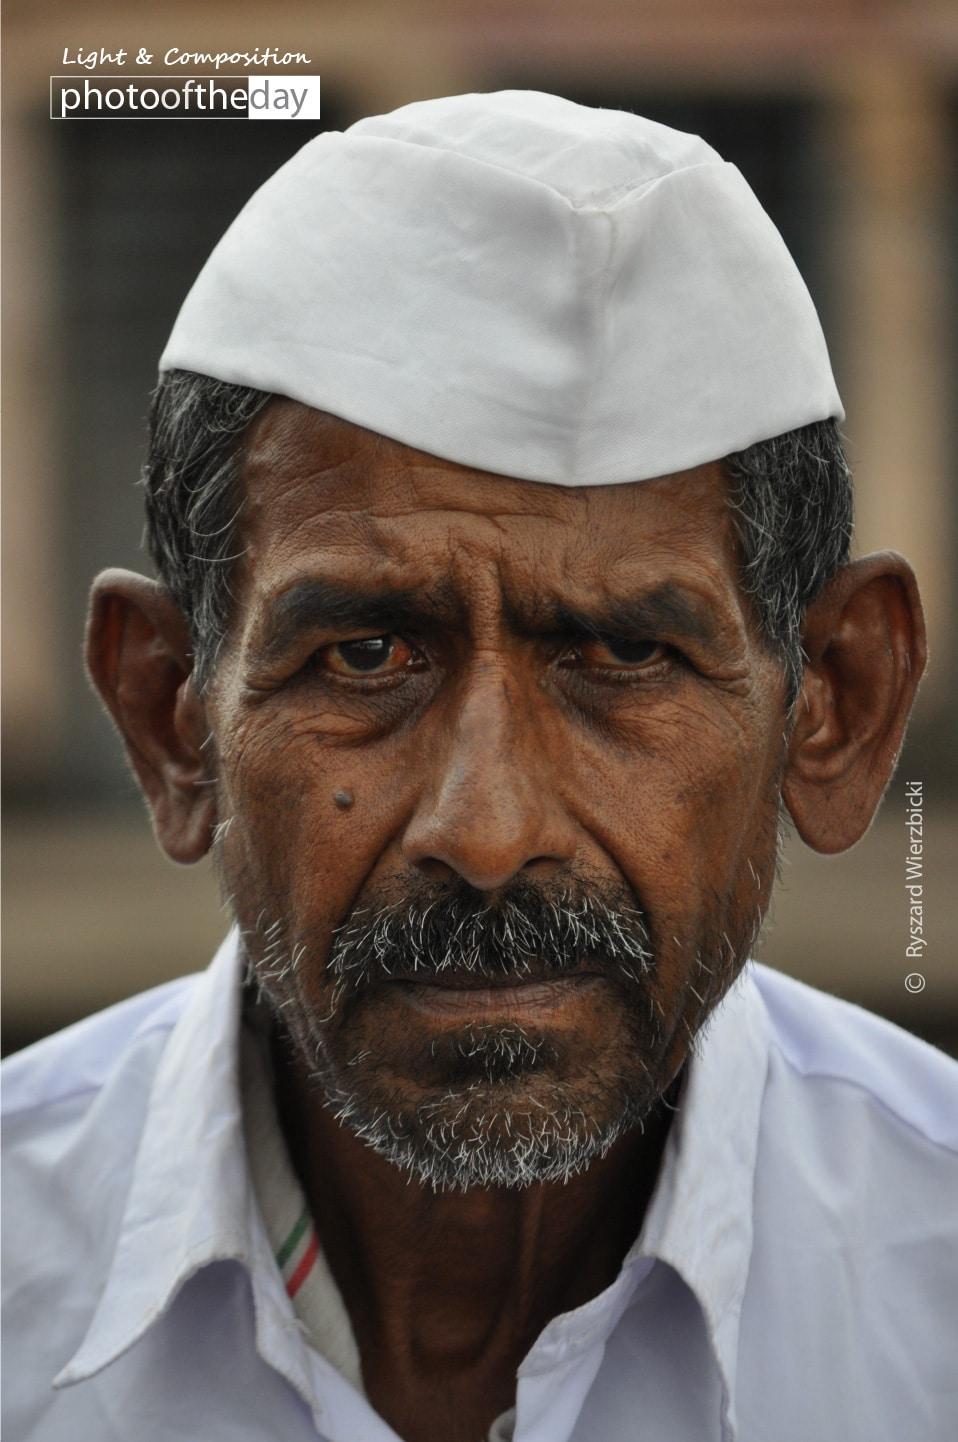 An Old Man from Pune by Ryszard Wierzbicki